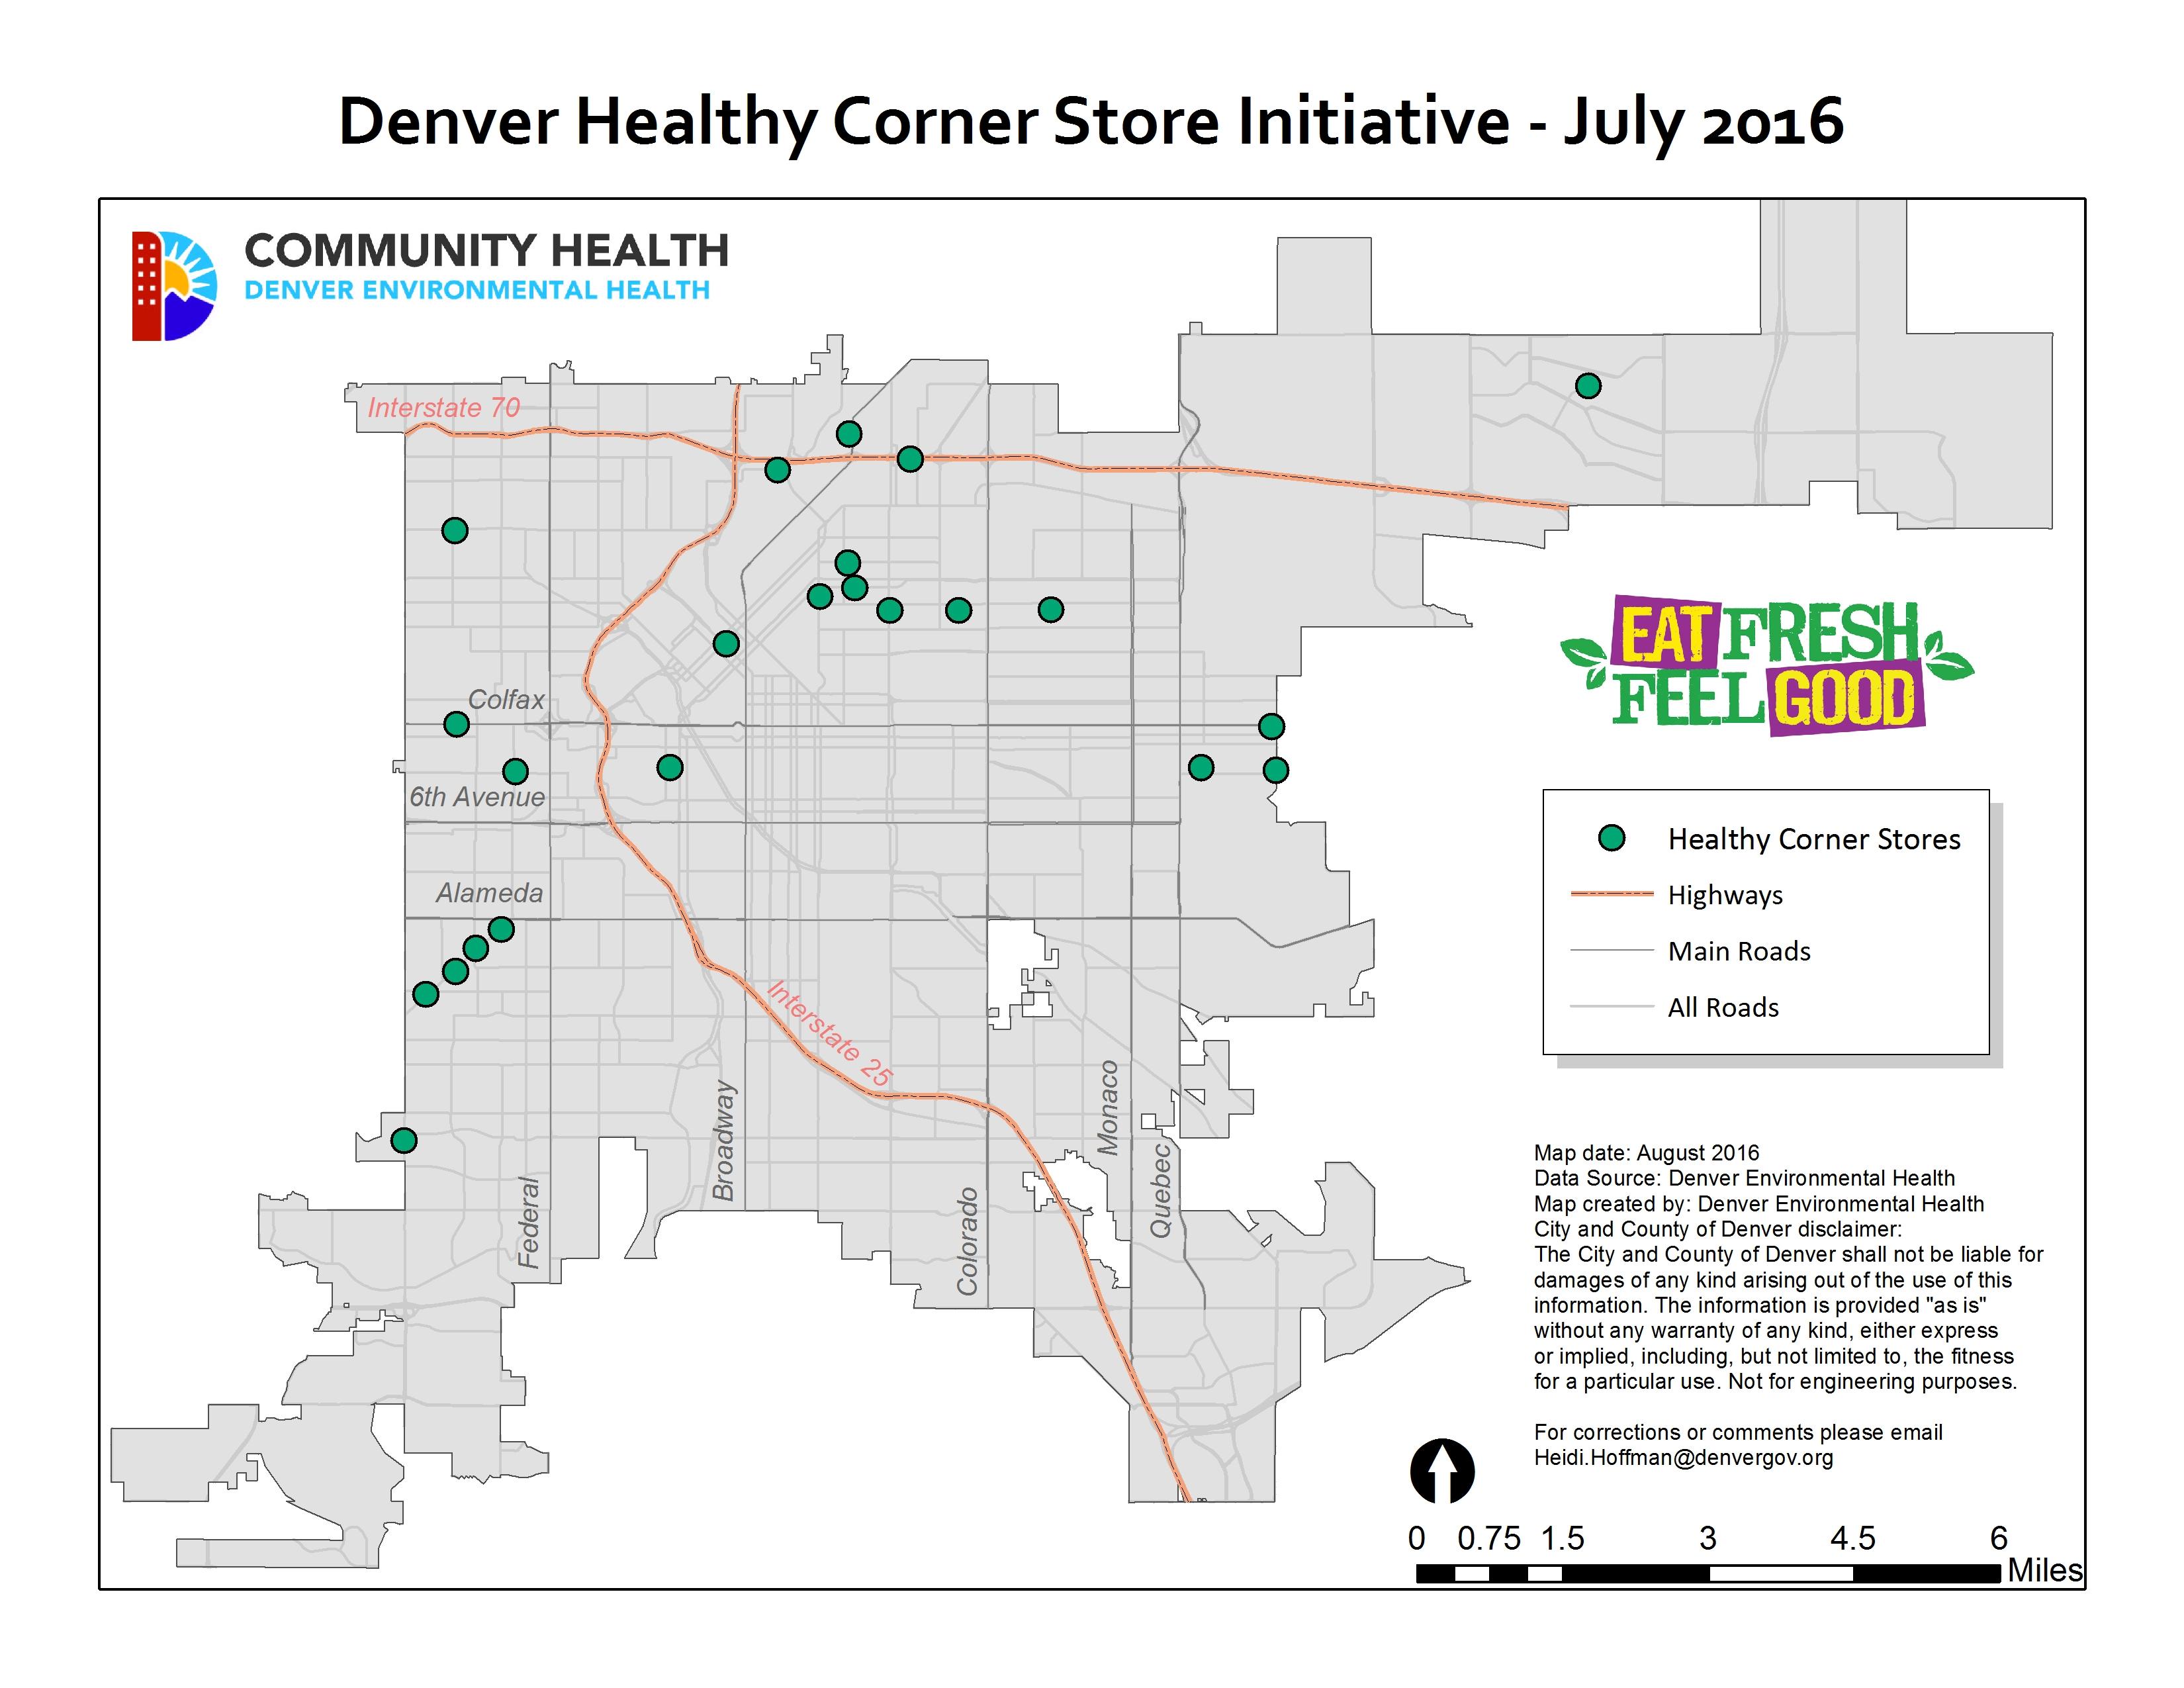 Environmental Health Community Health Healthy Corner Stores